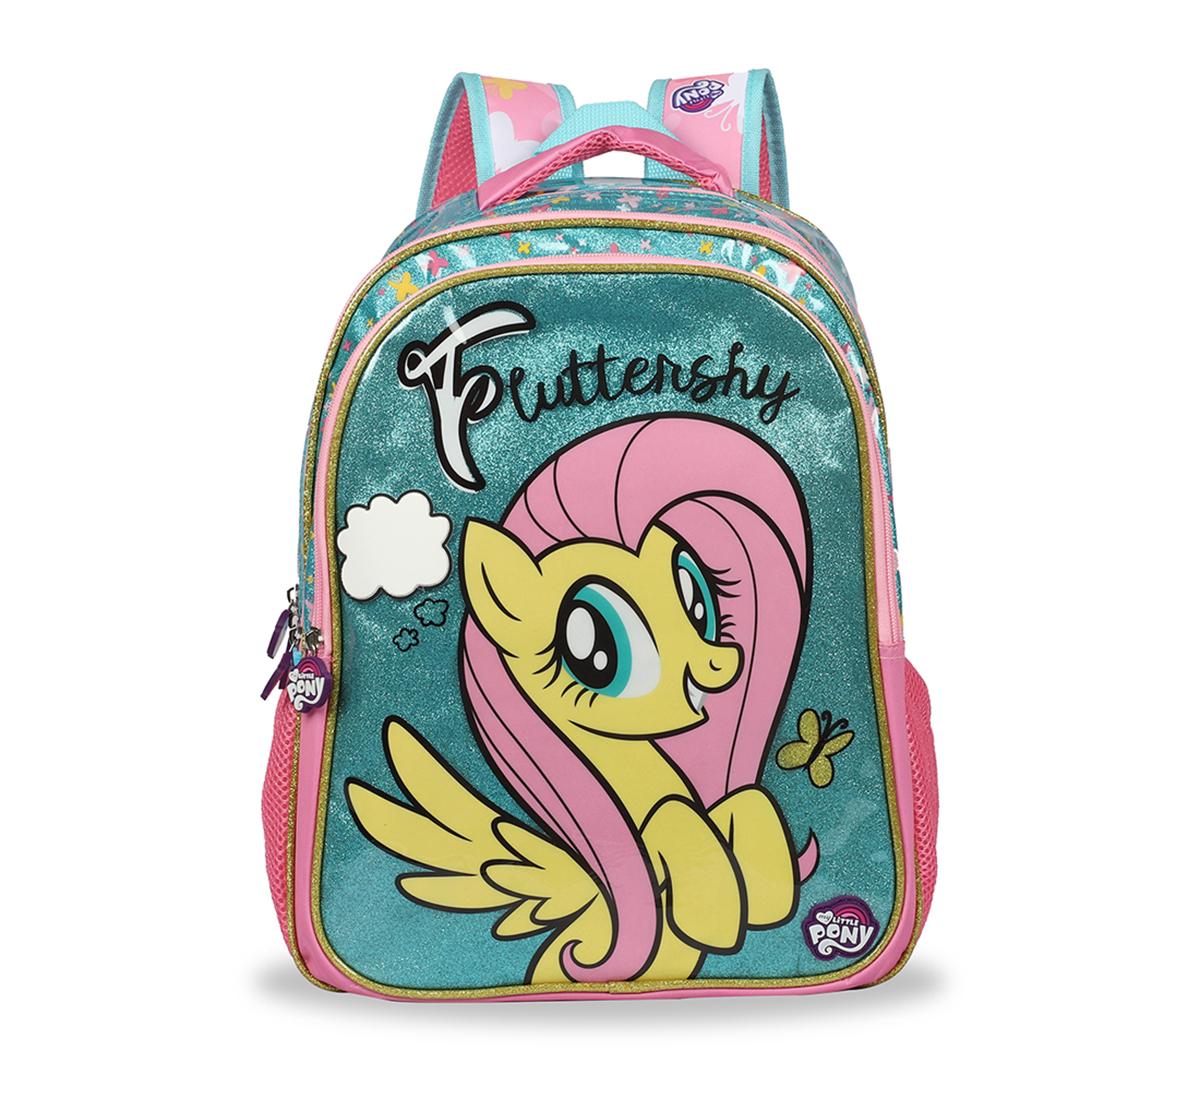 My Little Pony | My Little Pony My Little Pony Glitter School Bag 41 Cm Bags for Girls age 7Y+